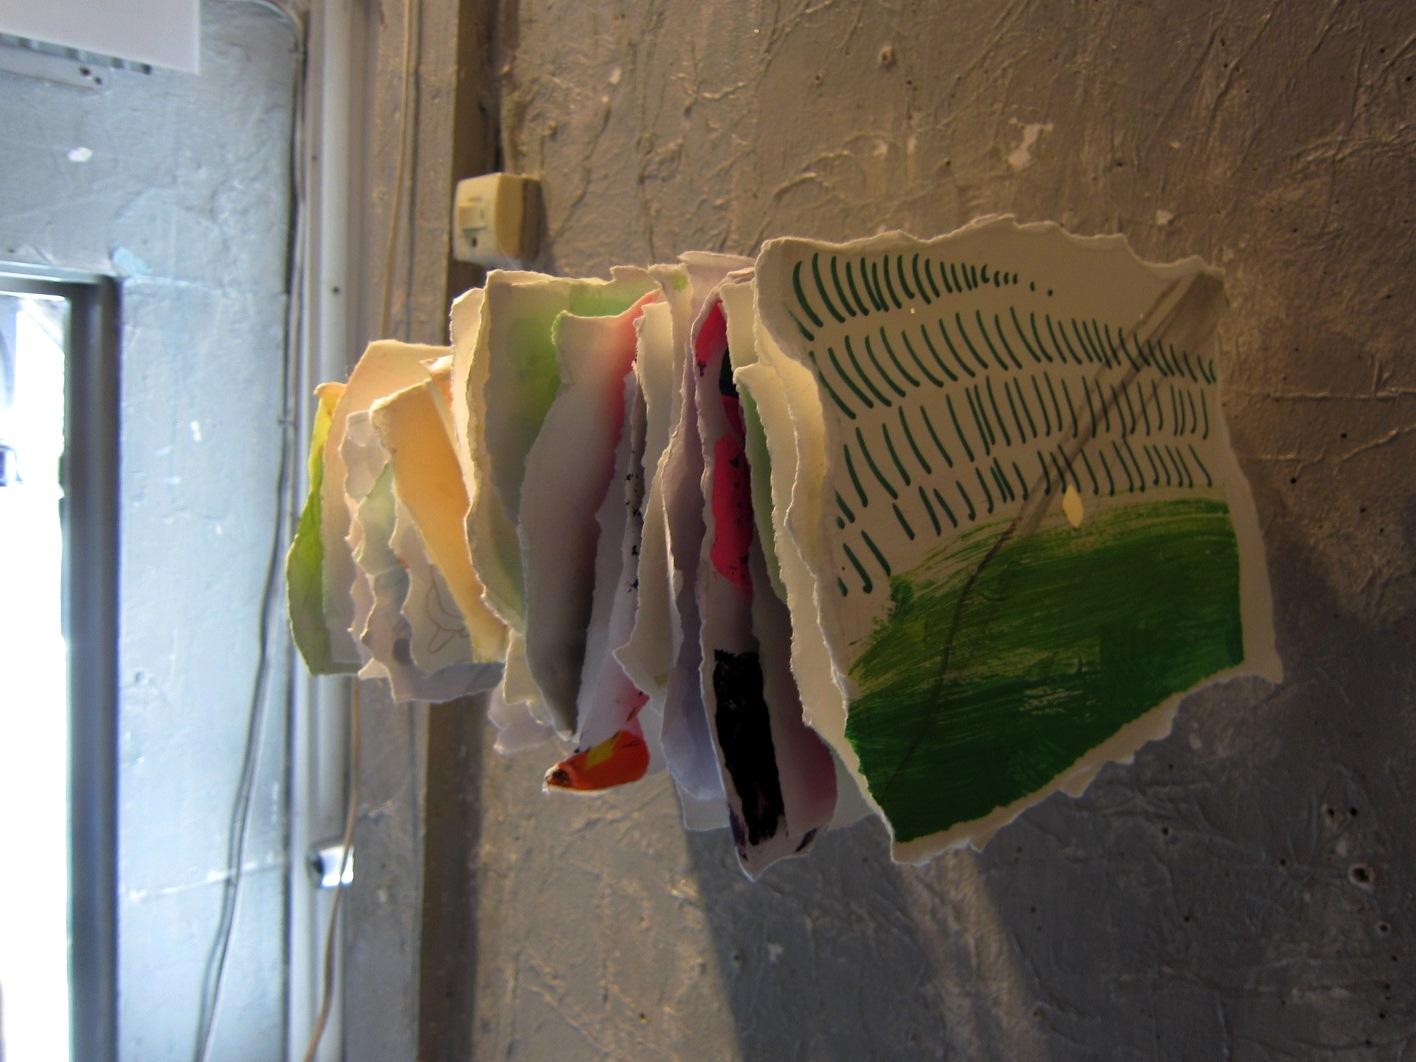 2020) 「jobin. とpaterの二人展 『ハルナデ展2013』」 ニュー・スター 4月15 日(月)~4月29日(日)  _f0126829_0582991.jpg